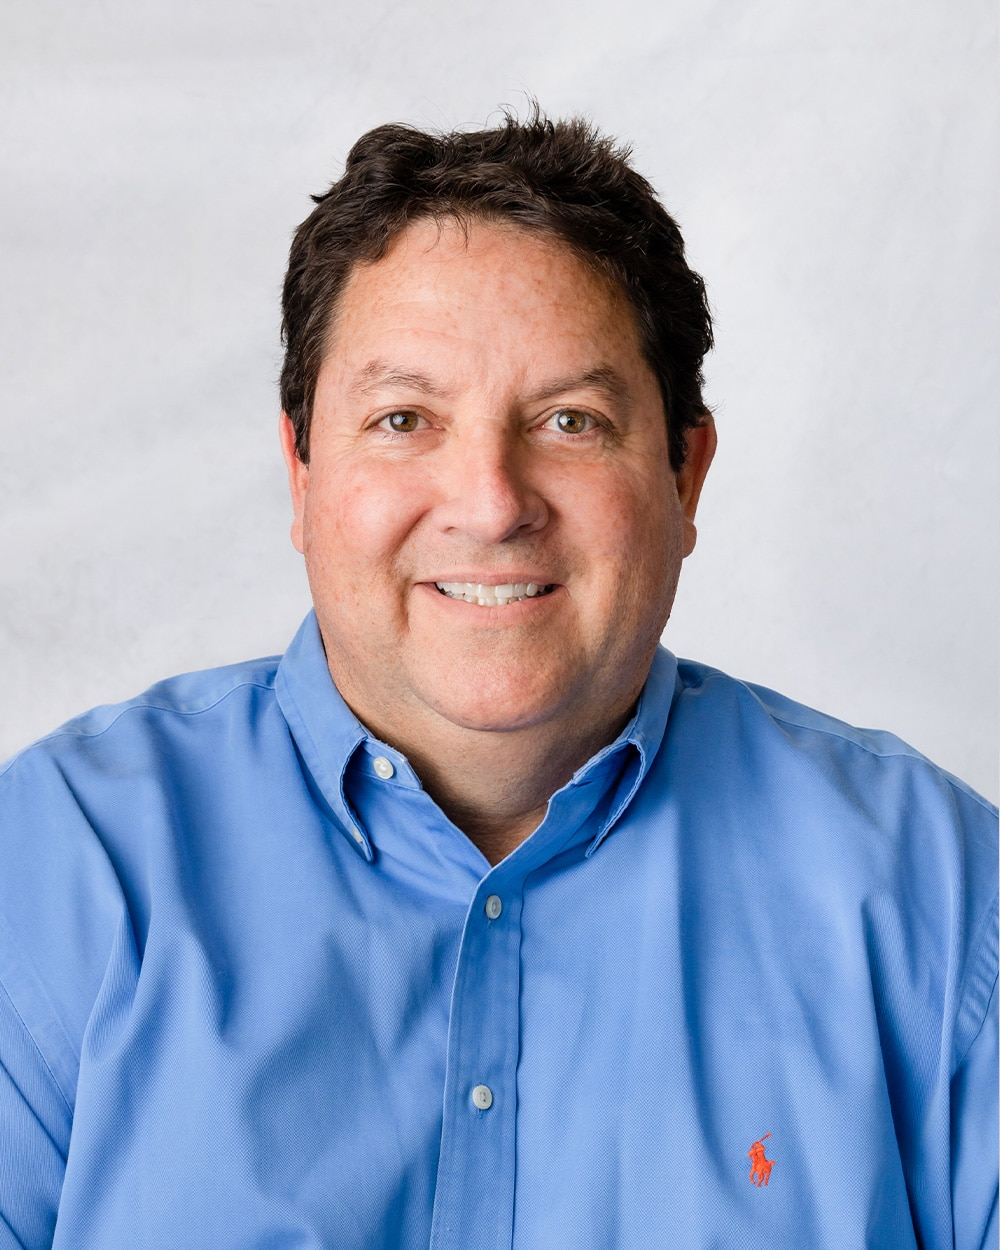 daniel roberts md facep - Fort Worth EM Residency Program